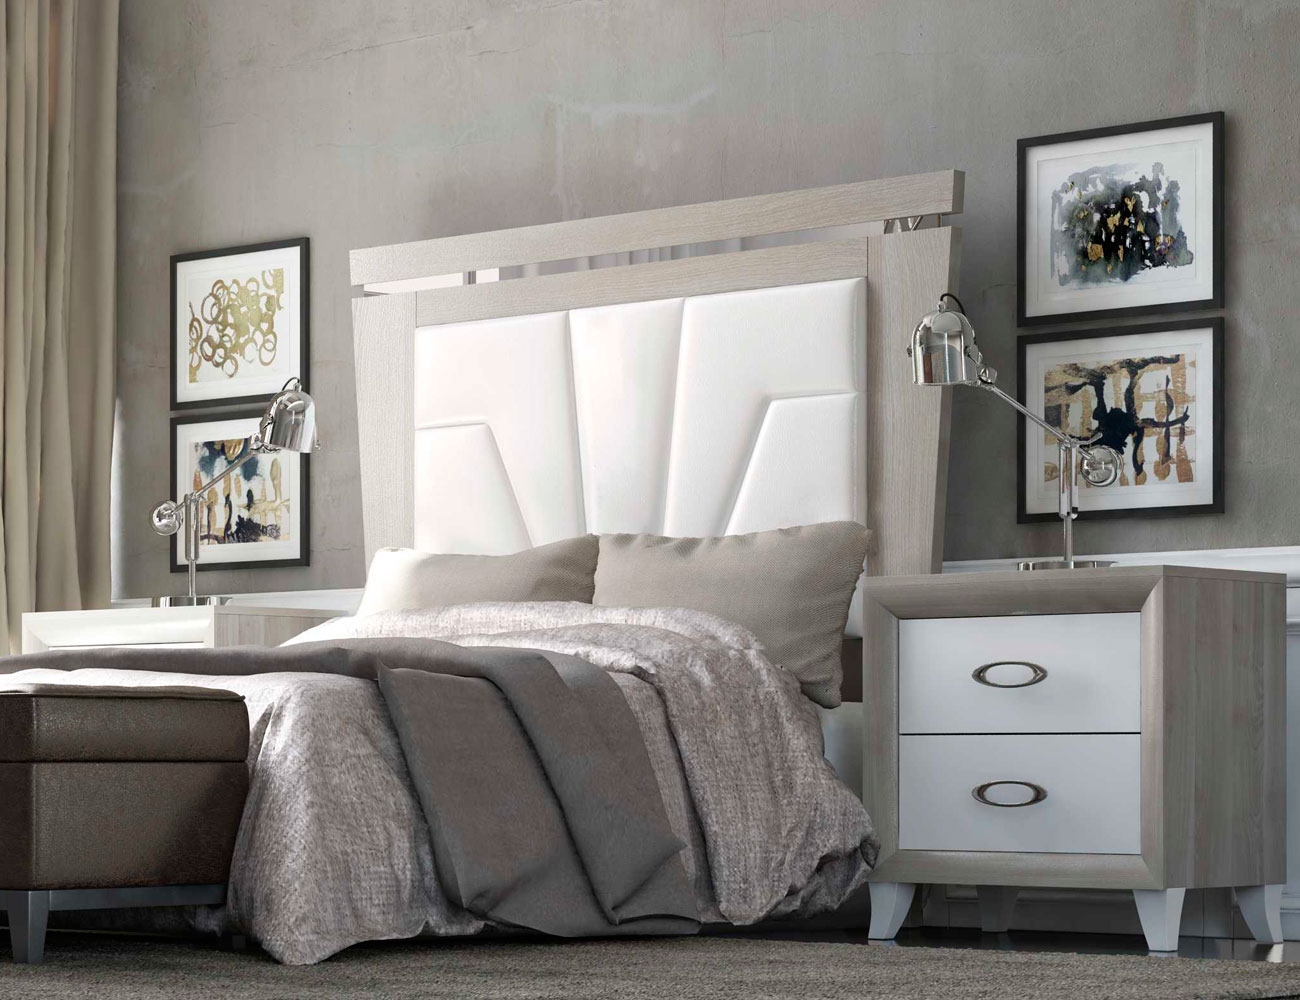 Dormitorio matrimonio romantico con desmaquilladora detalle